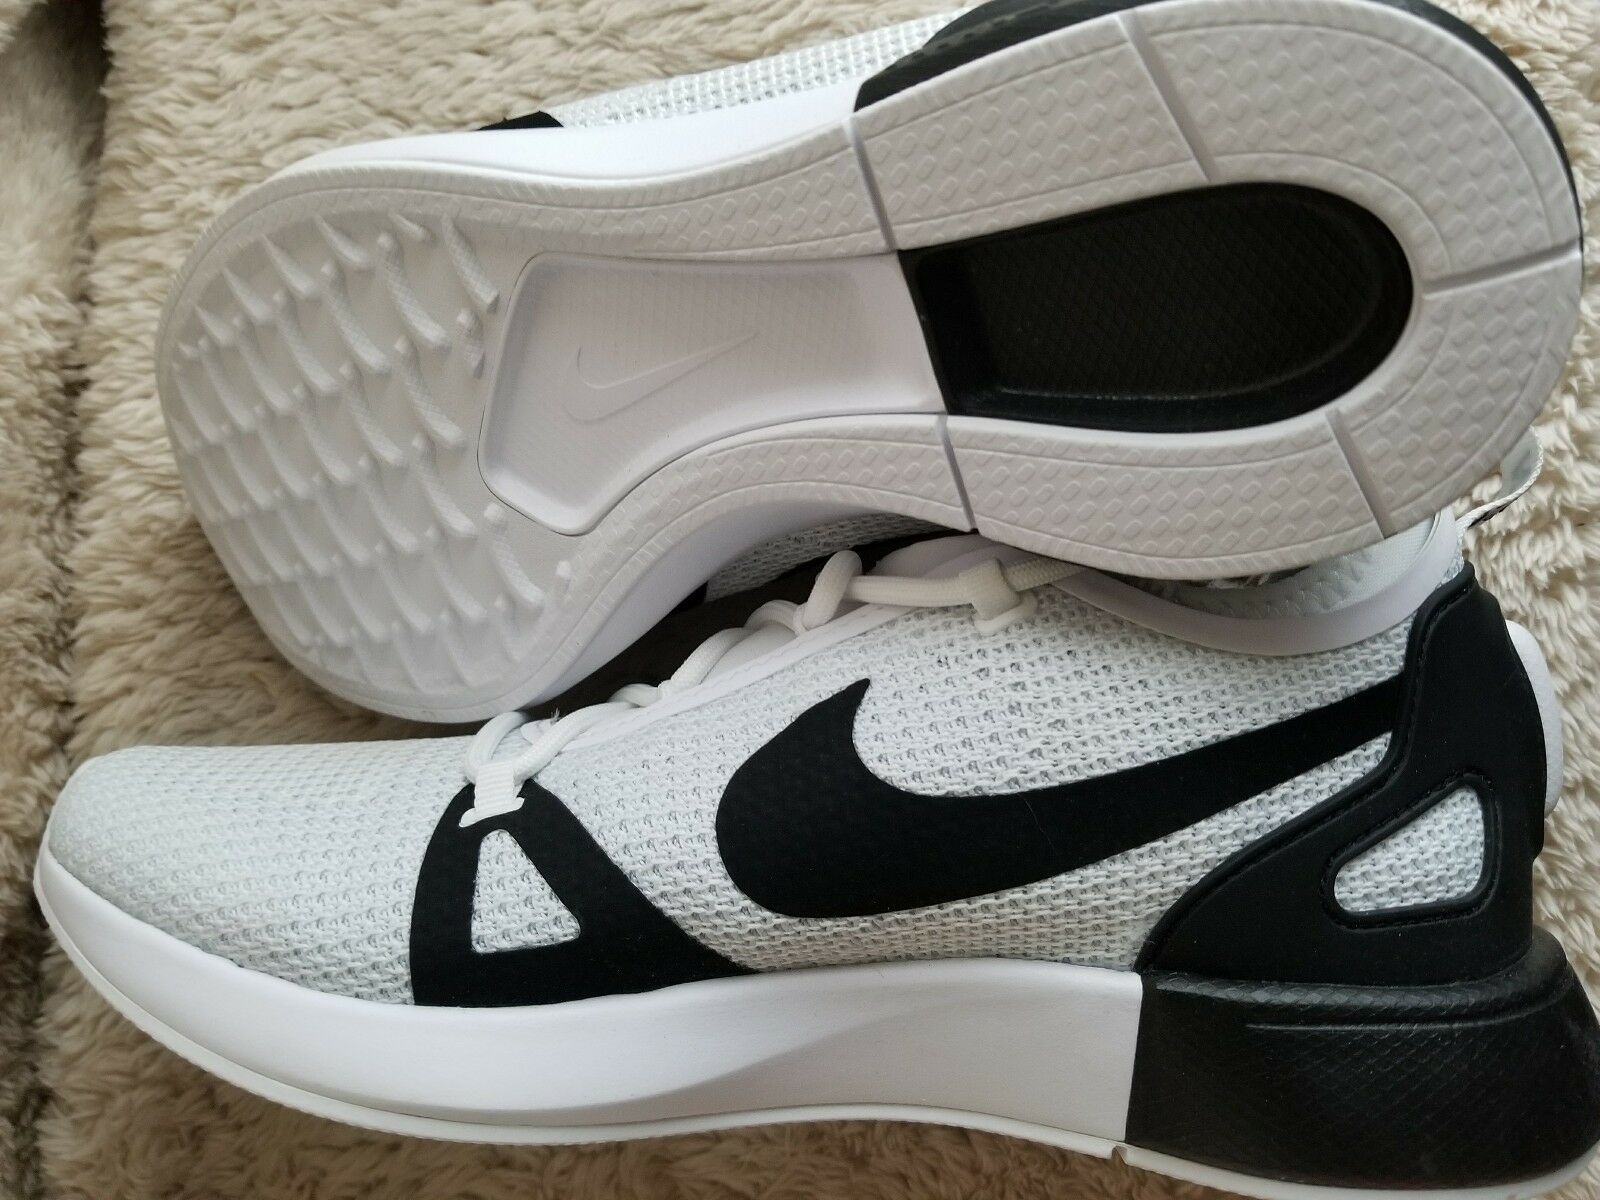 sports shoes aae93 419f9 ... Nike Duel Racer 918228-102 White Black Platinum Men s Sportswear  Sportswear Sportswear Running shoes 47d3ea